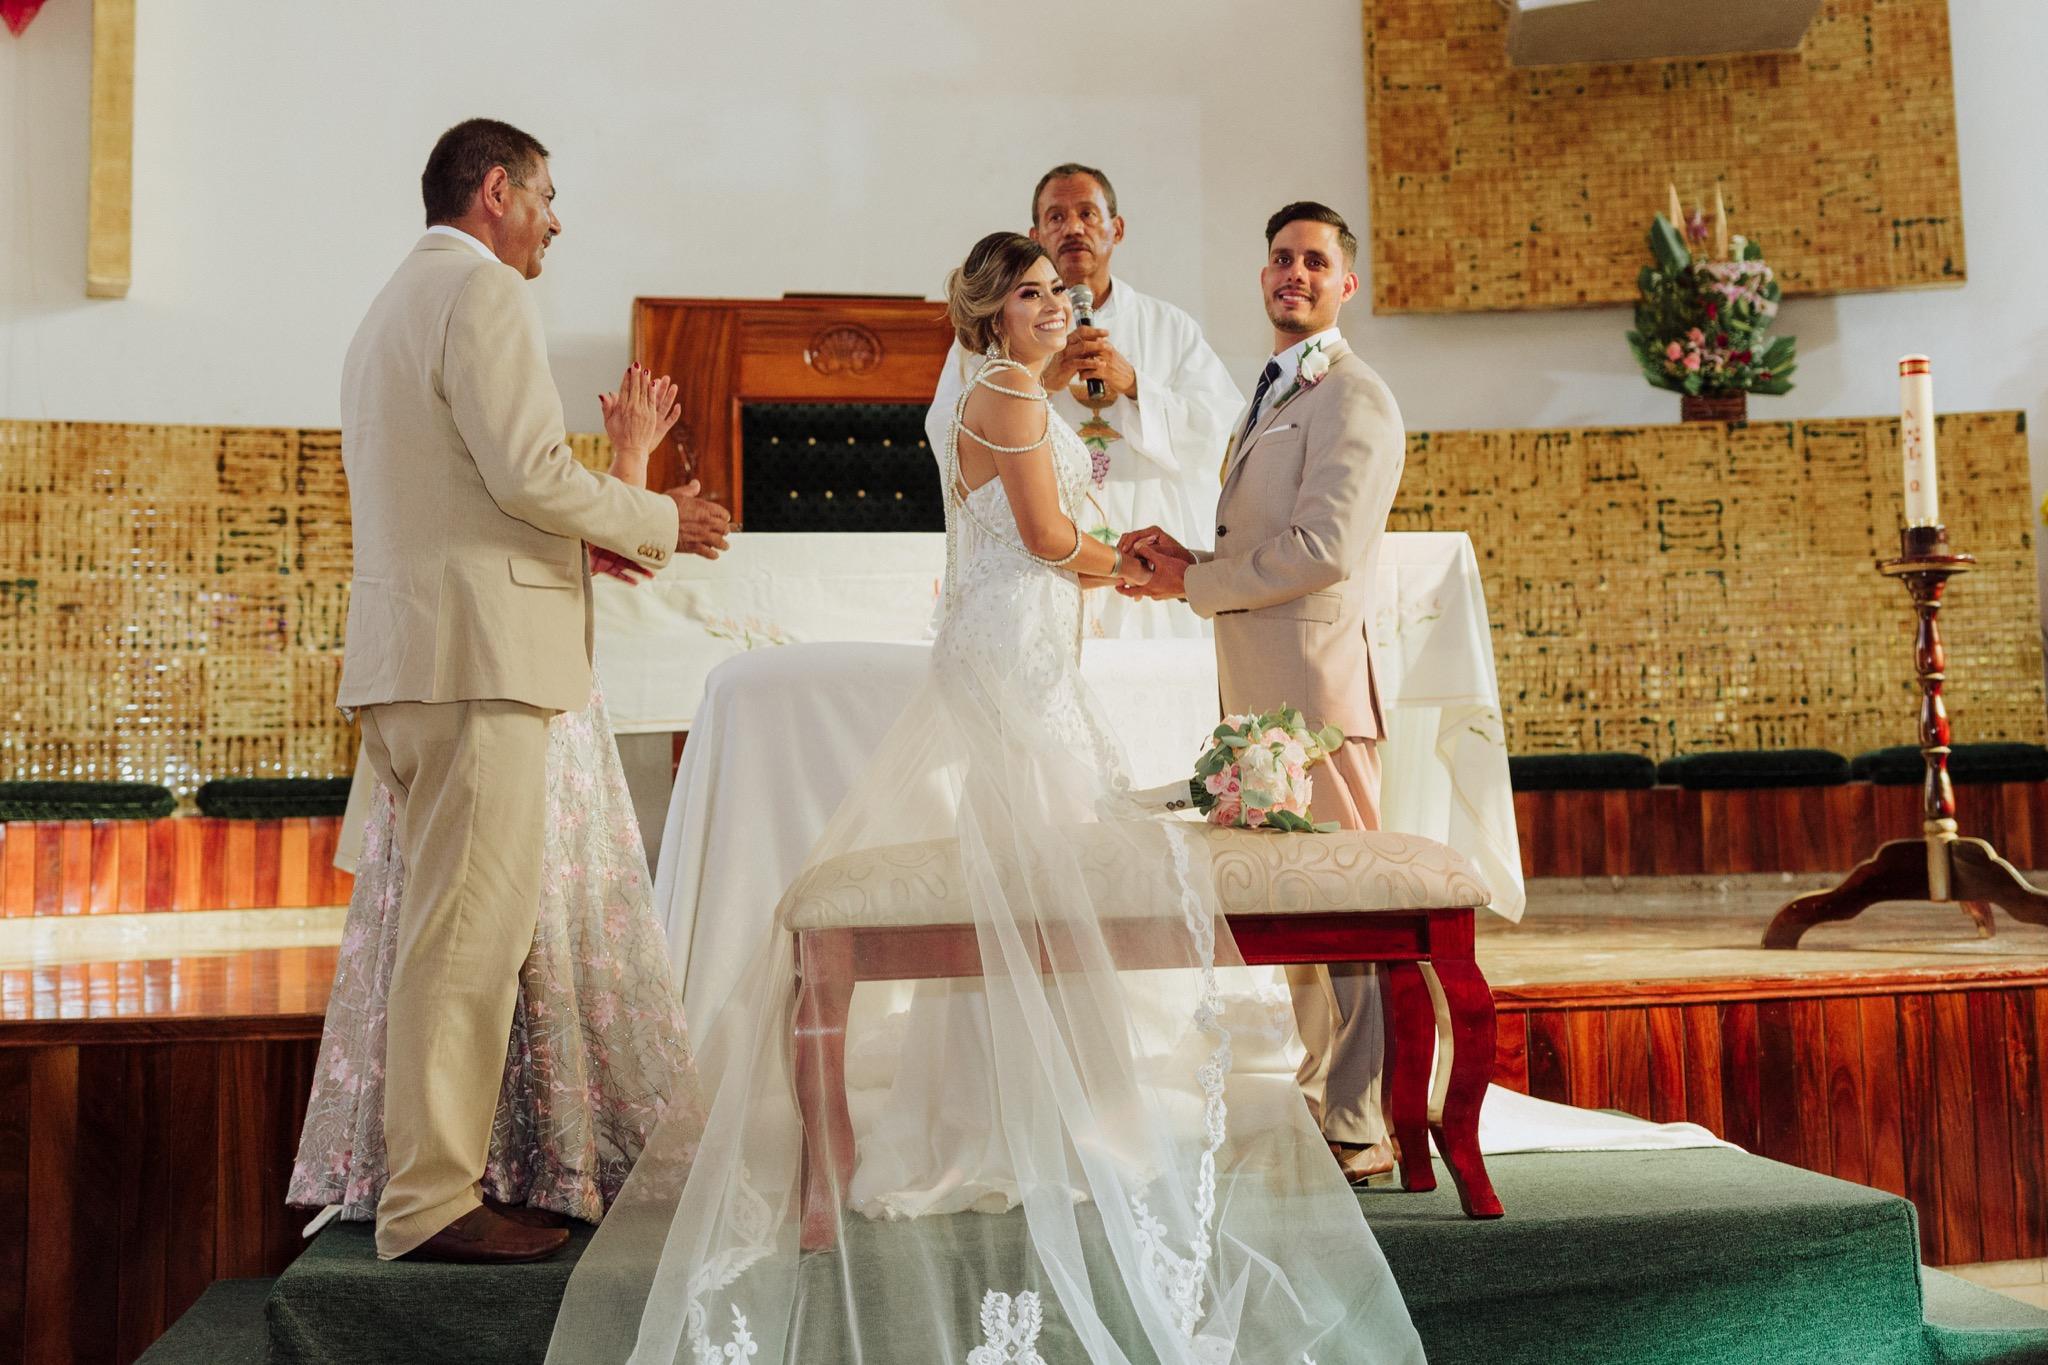 Javier_noriega_fotografo_bodas_profesional_zacatecas_mexico_mazatlan_sinaloa_photographer_weddings26